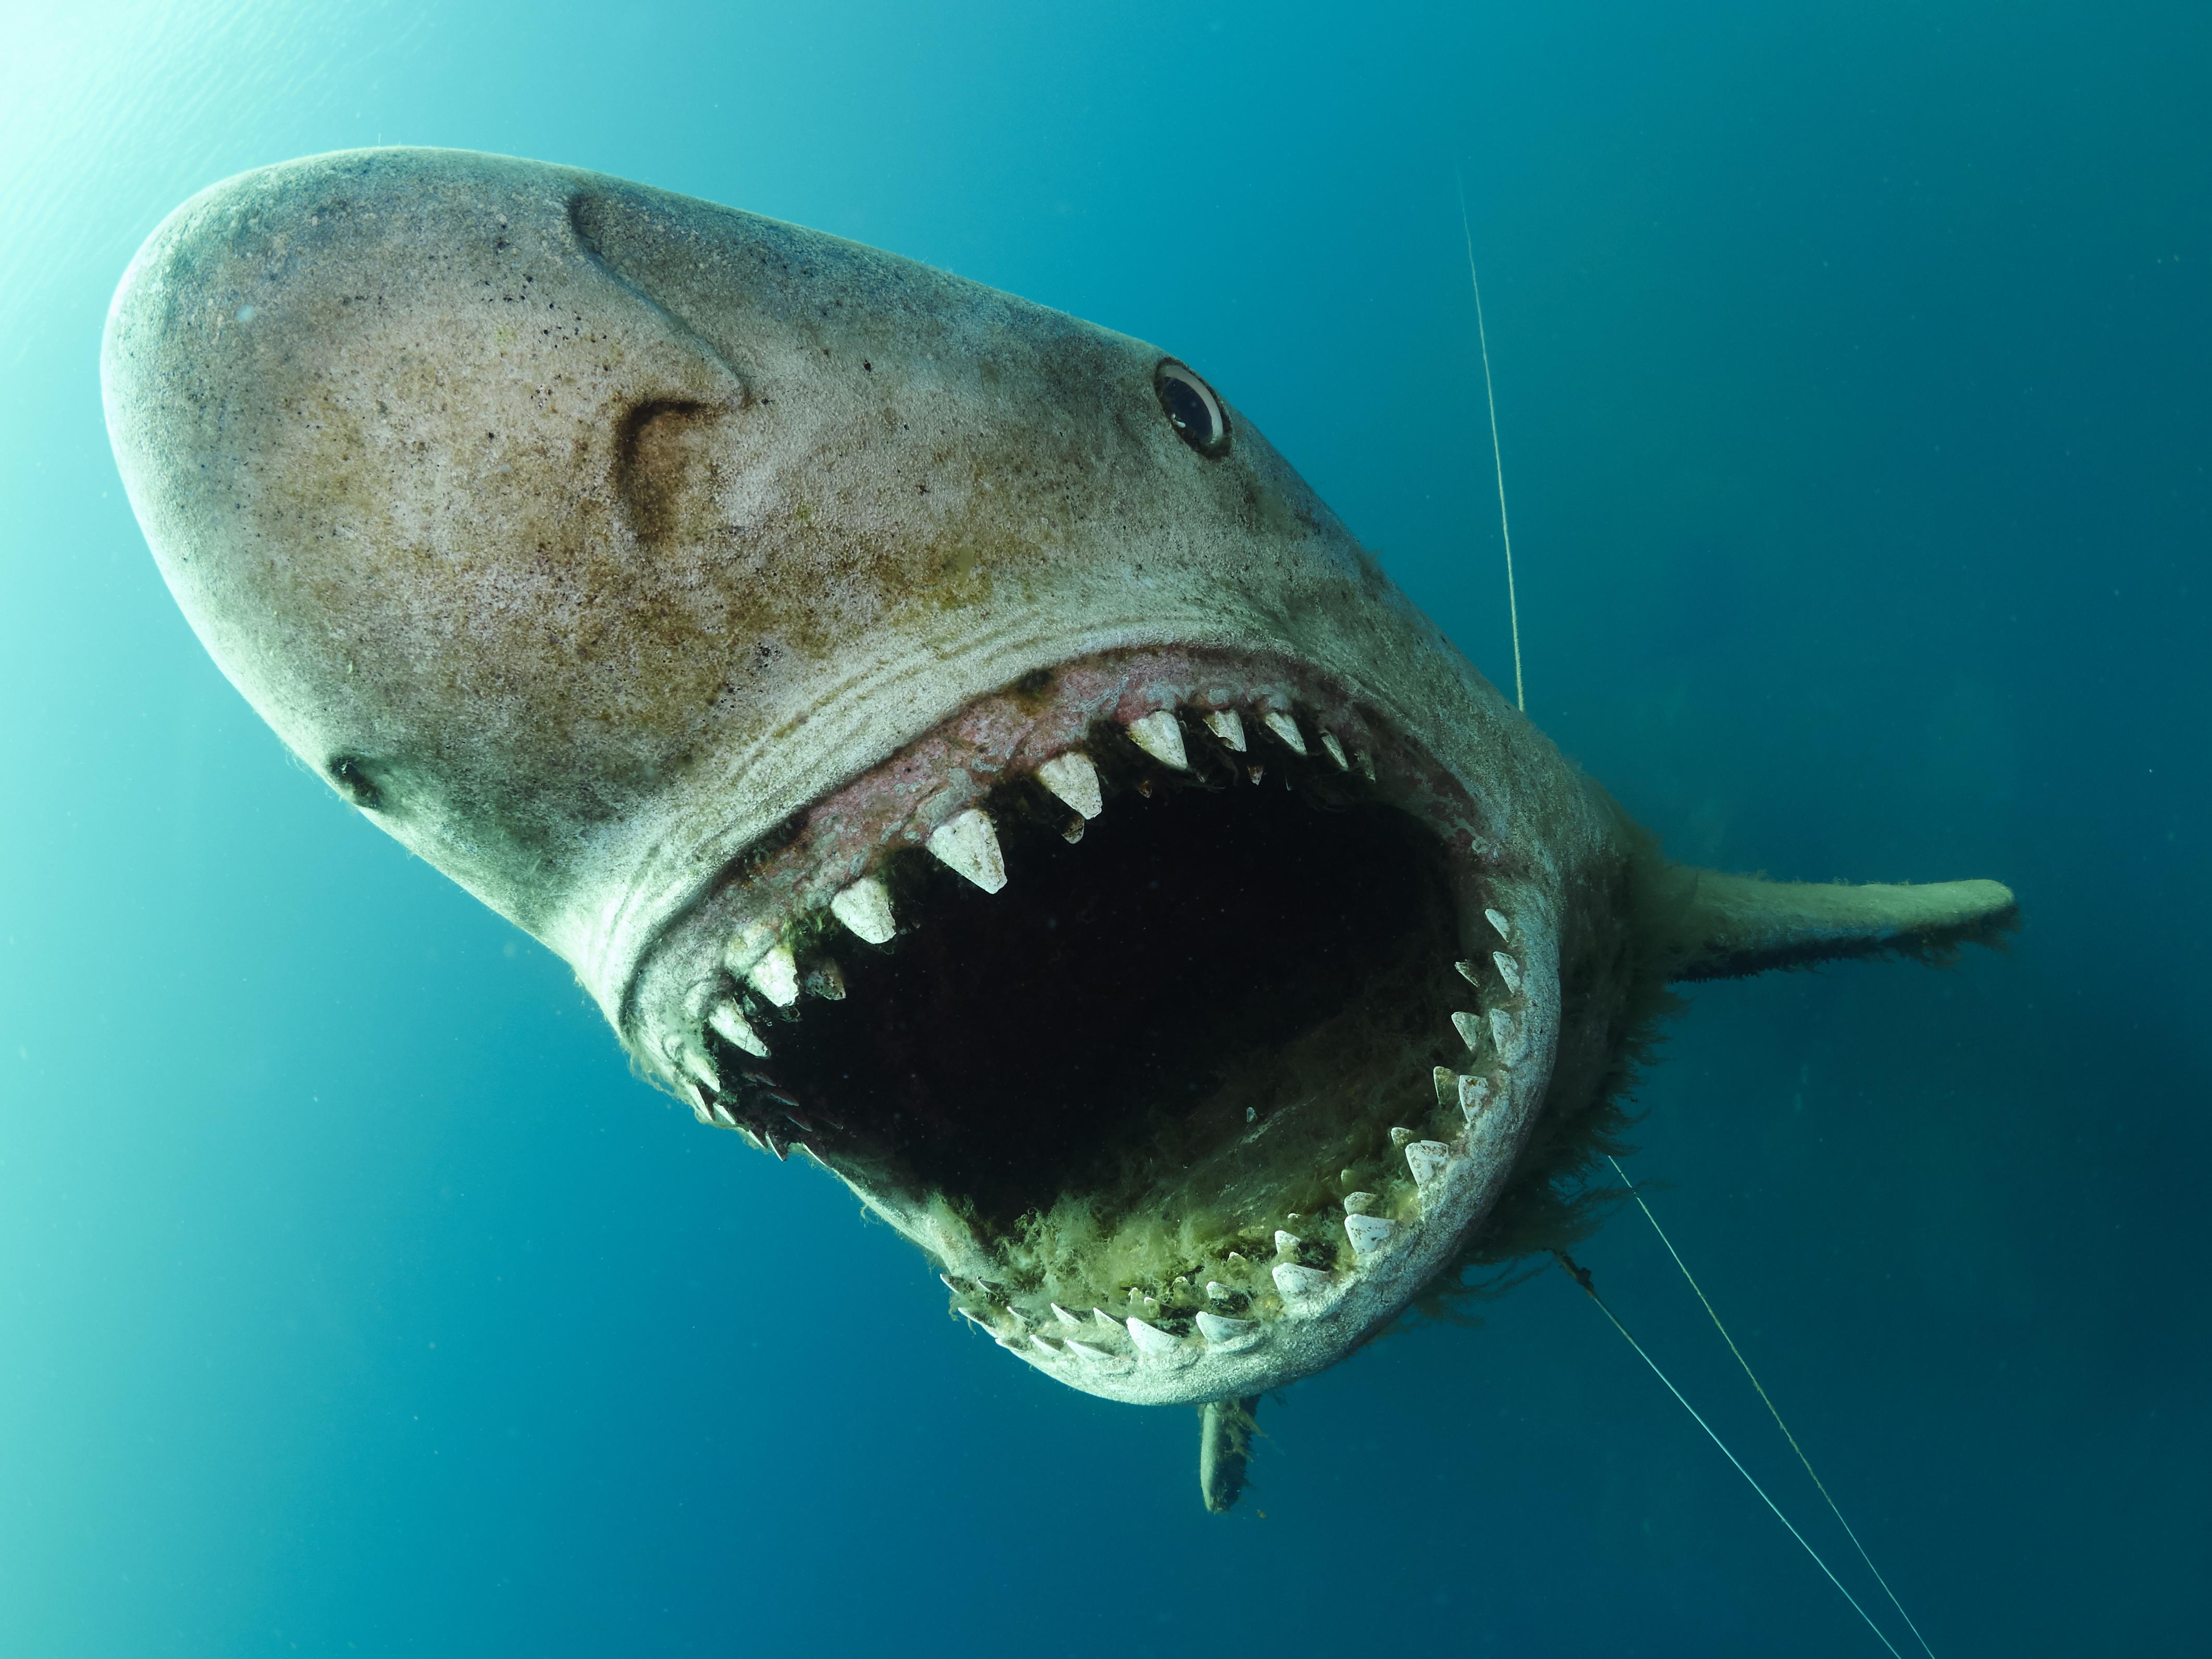 Hemmoor Kreidesee Shark